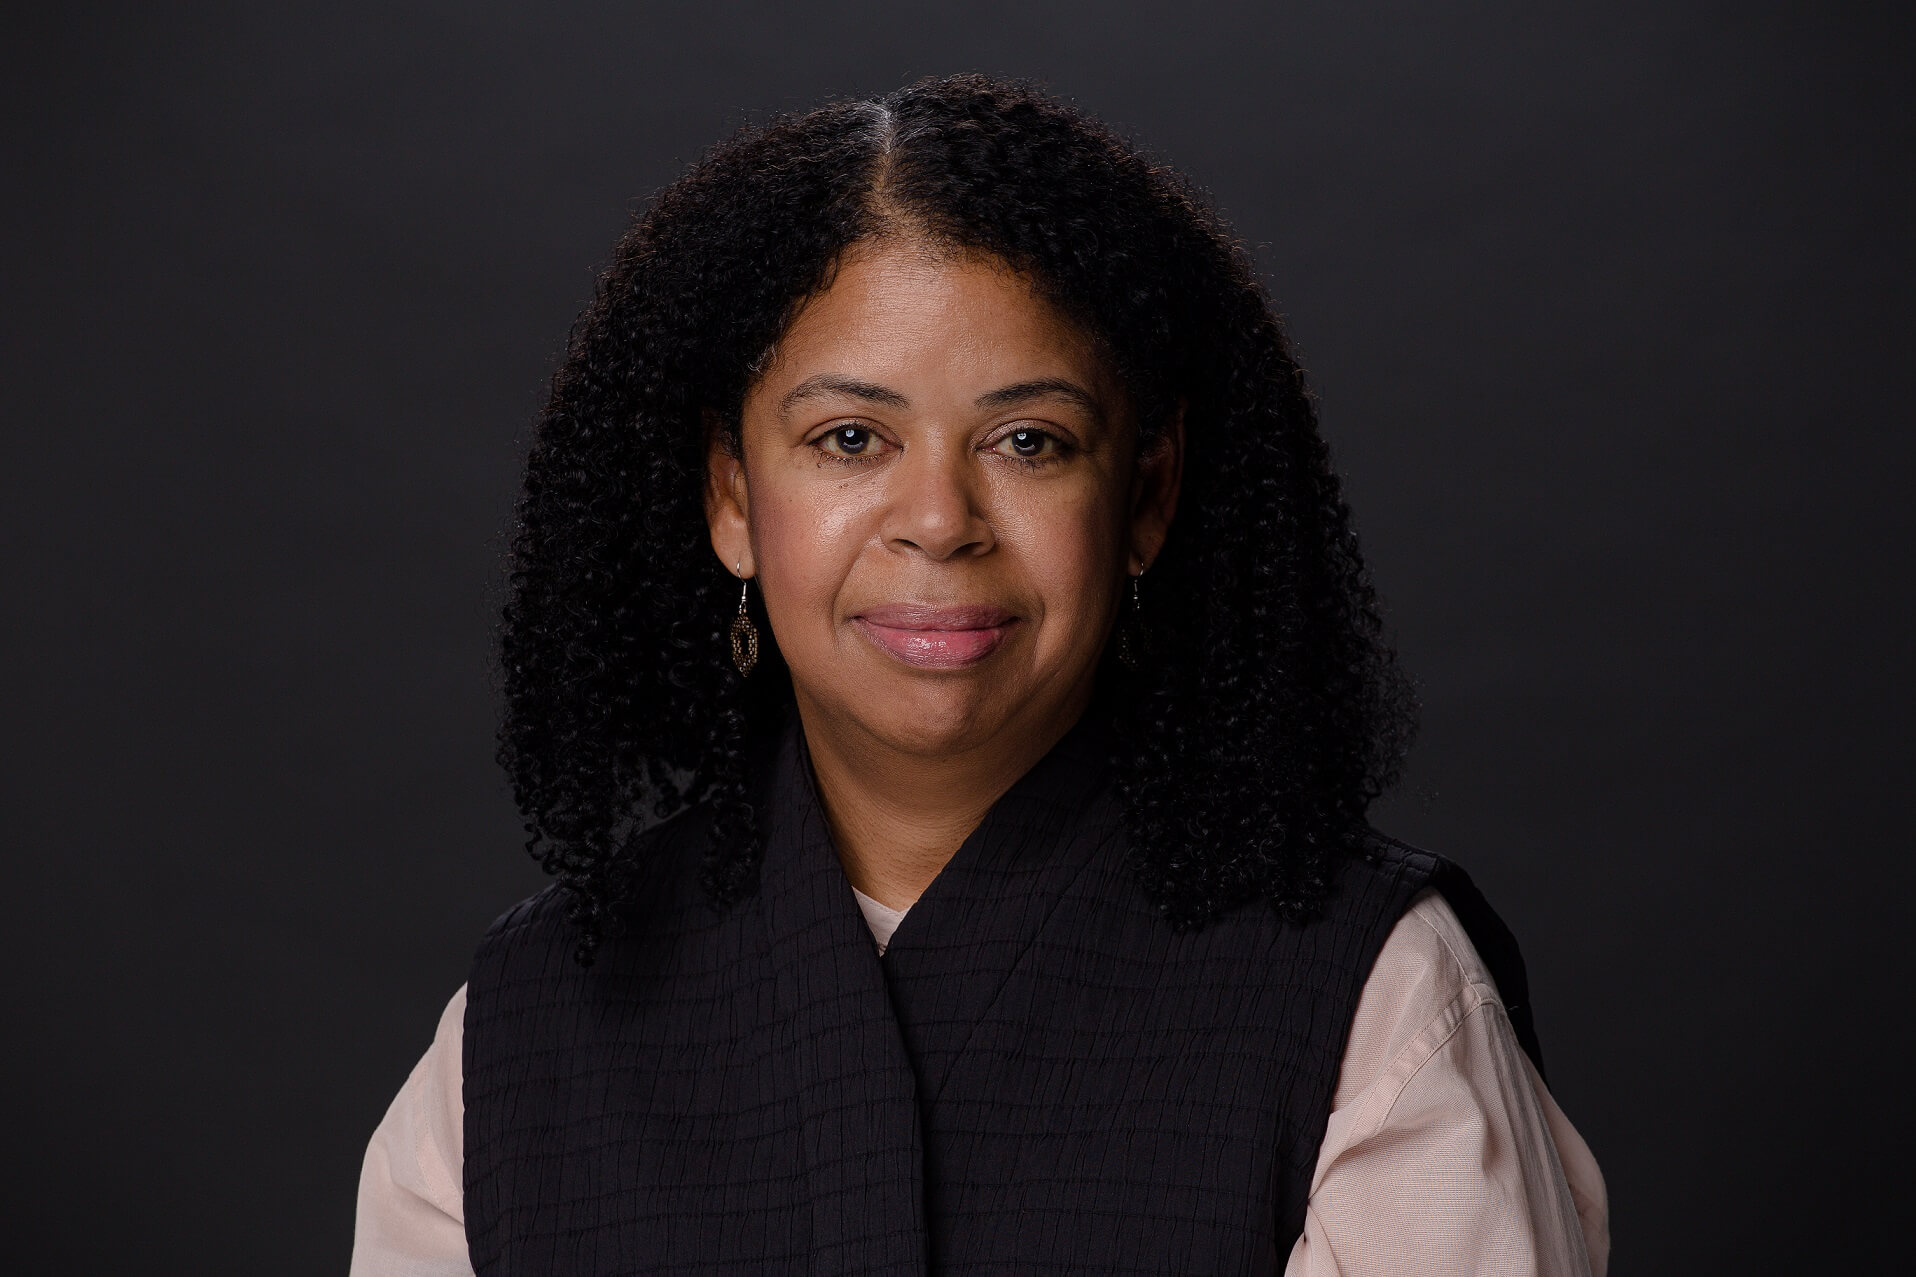 this black woman is curator of remai modern saskatoon